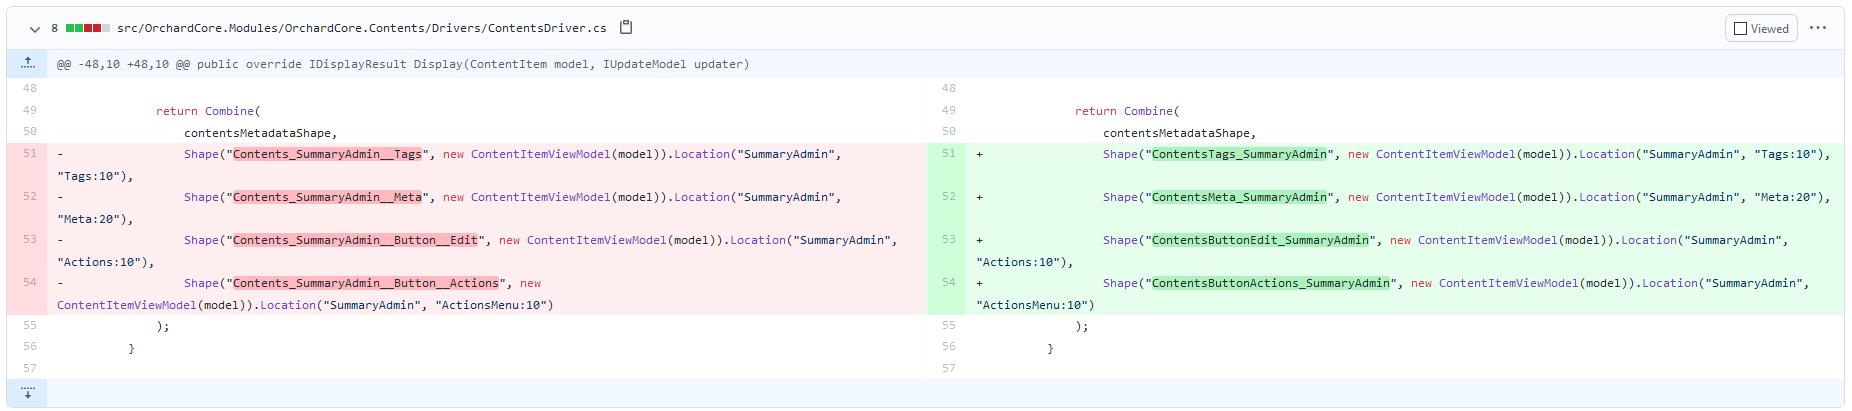 The renamed SummaryAdmin shapes